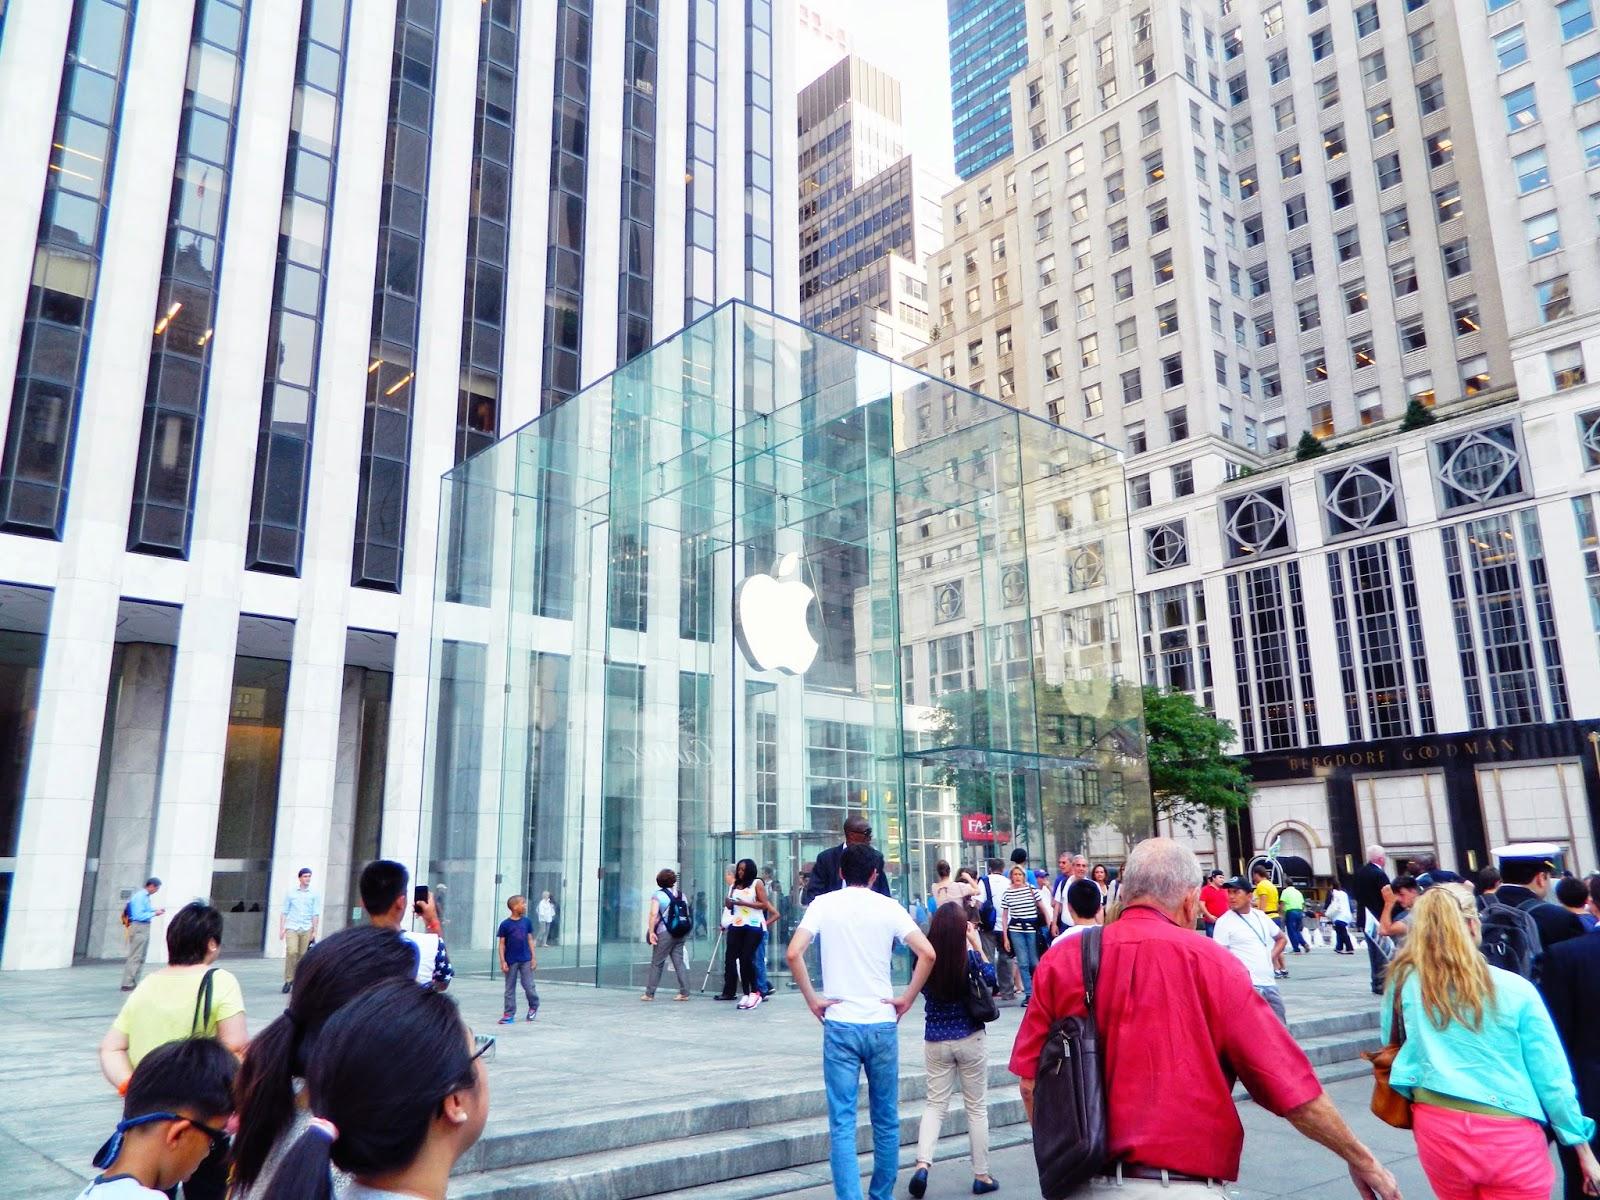 new york city 5th avenue apple cube glass architecture